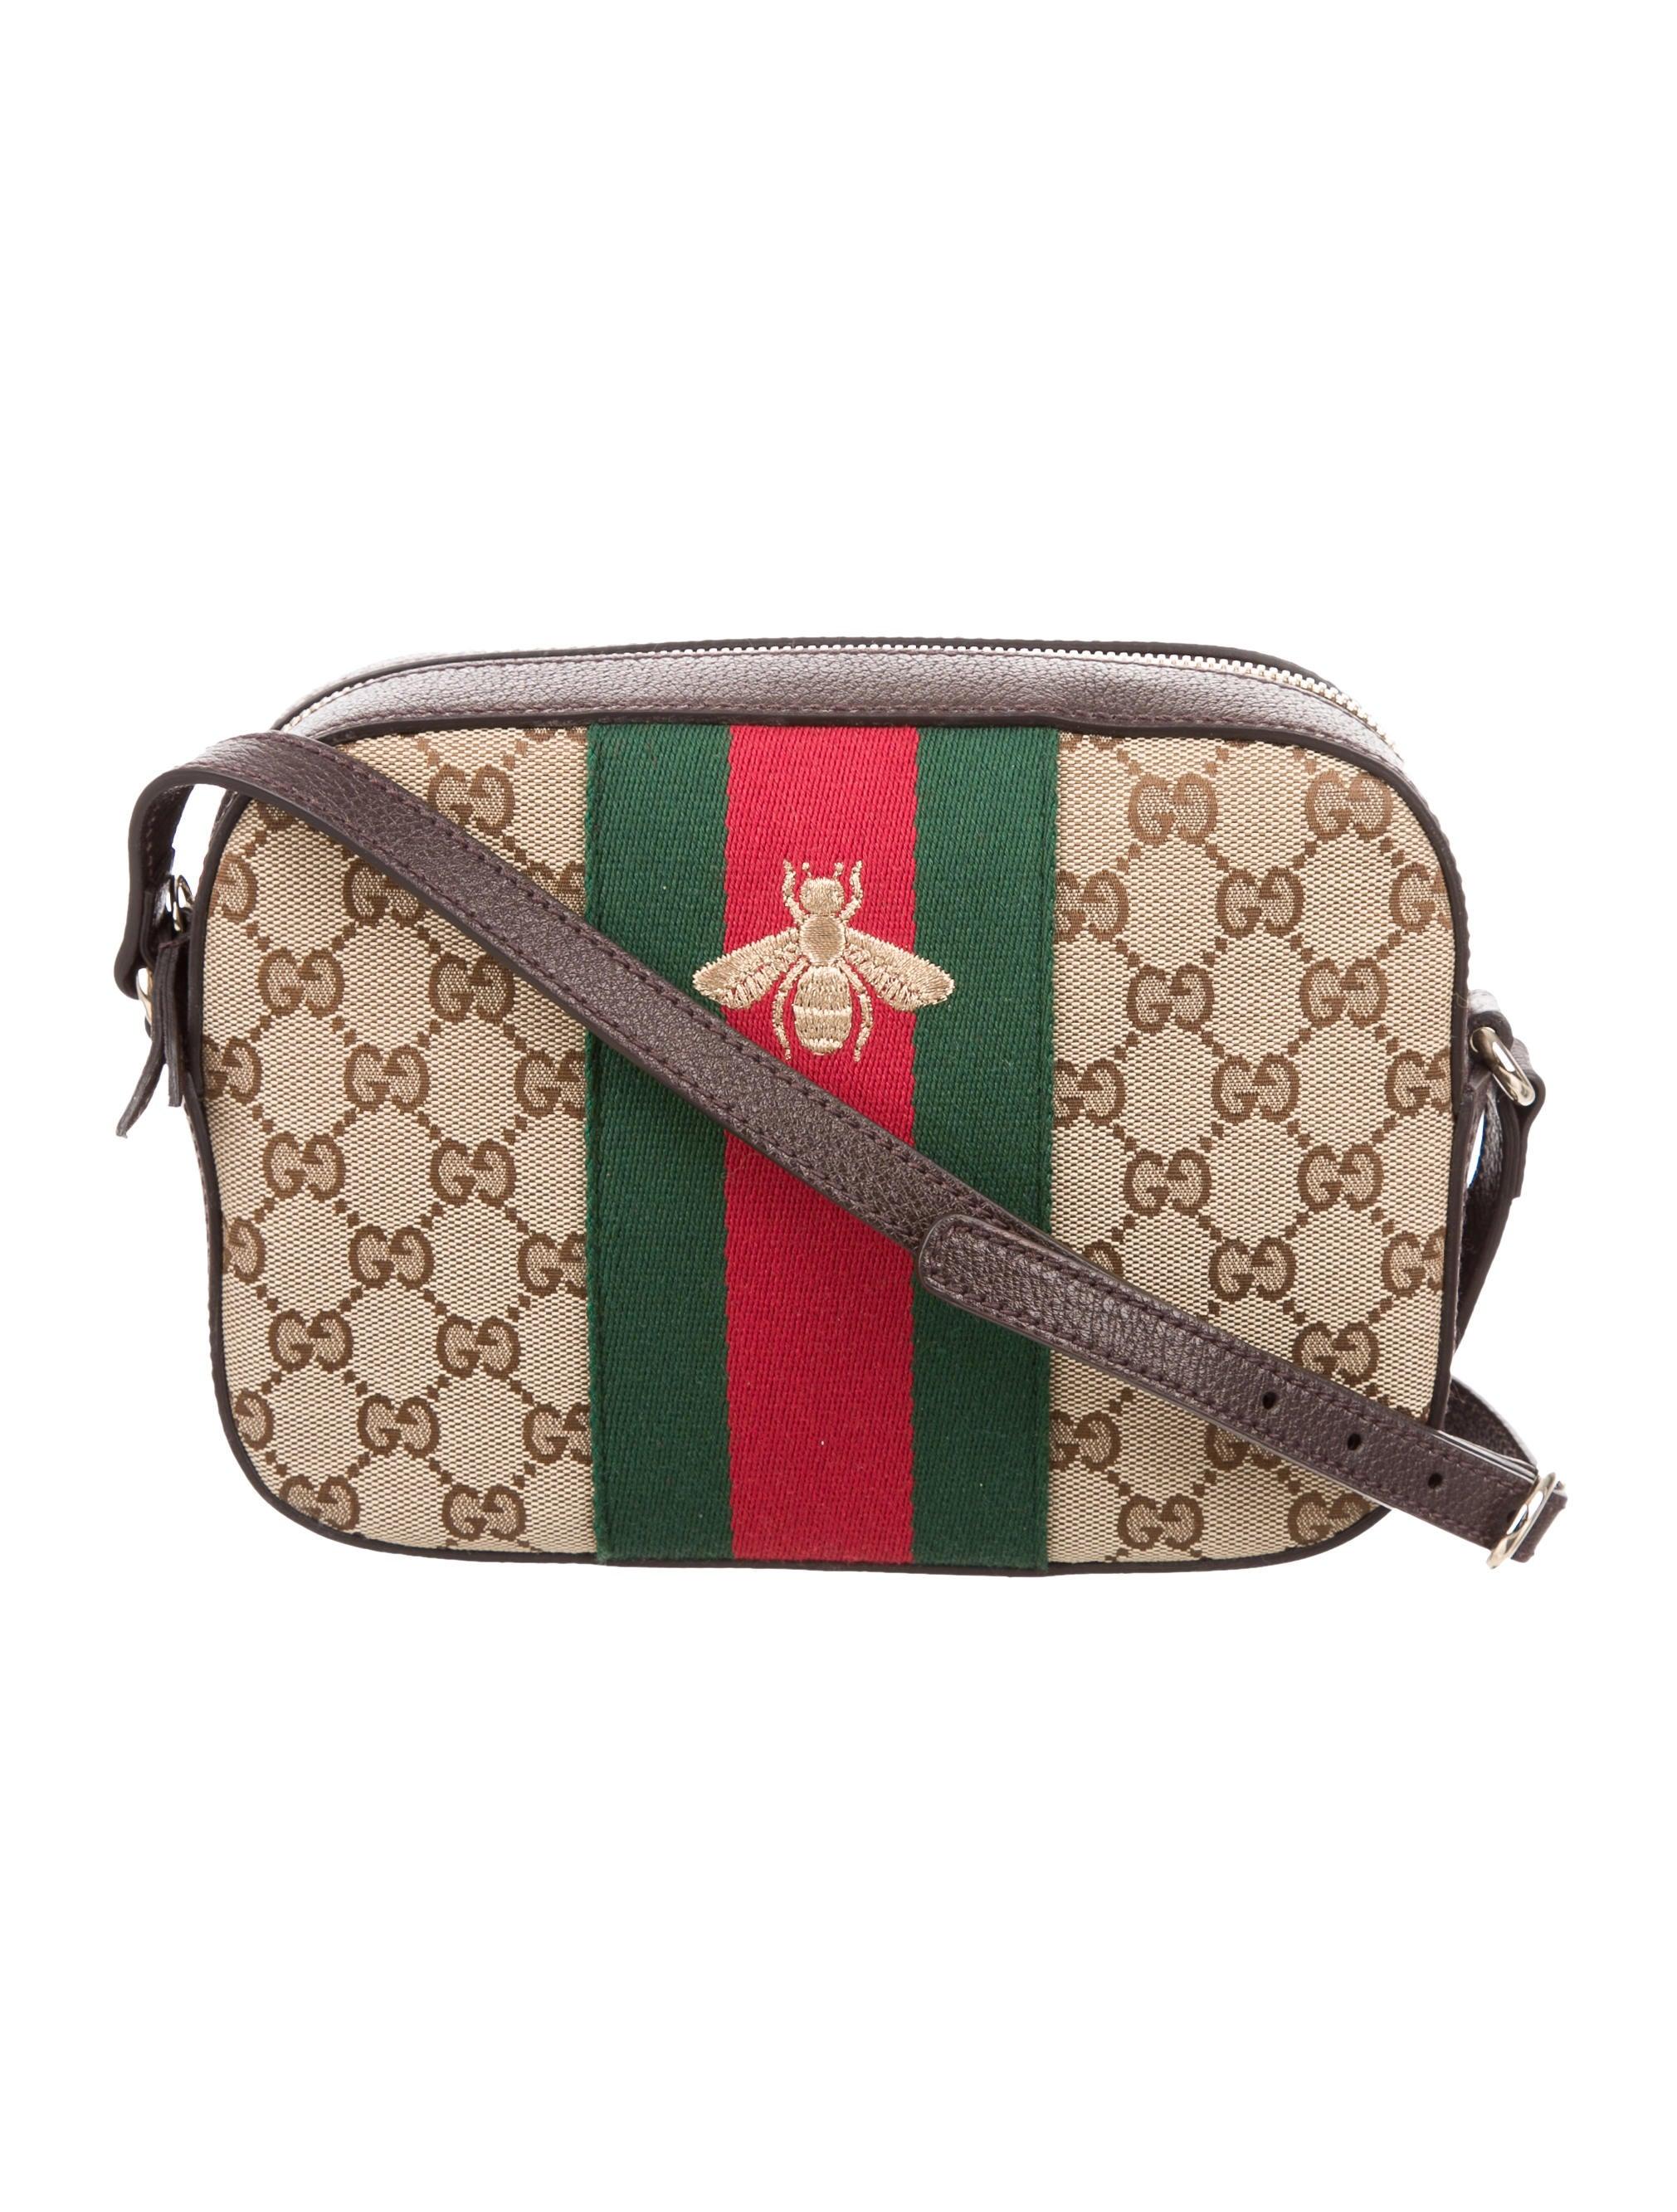 9c68e96c980c Gucci Webby Bee Crossbody Bag - Handbags - GUC136810 | The RealReal